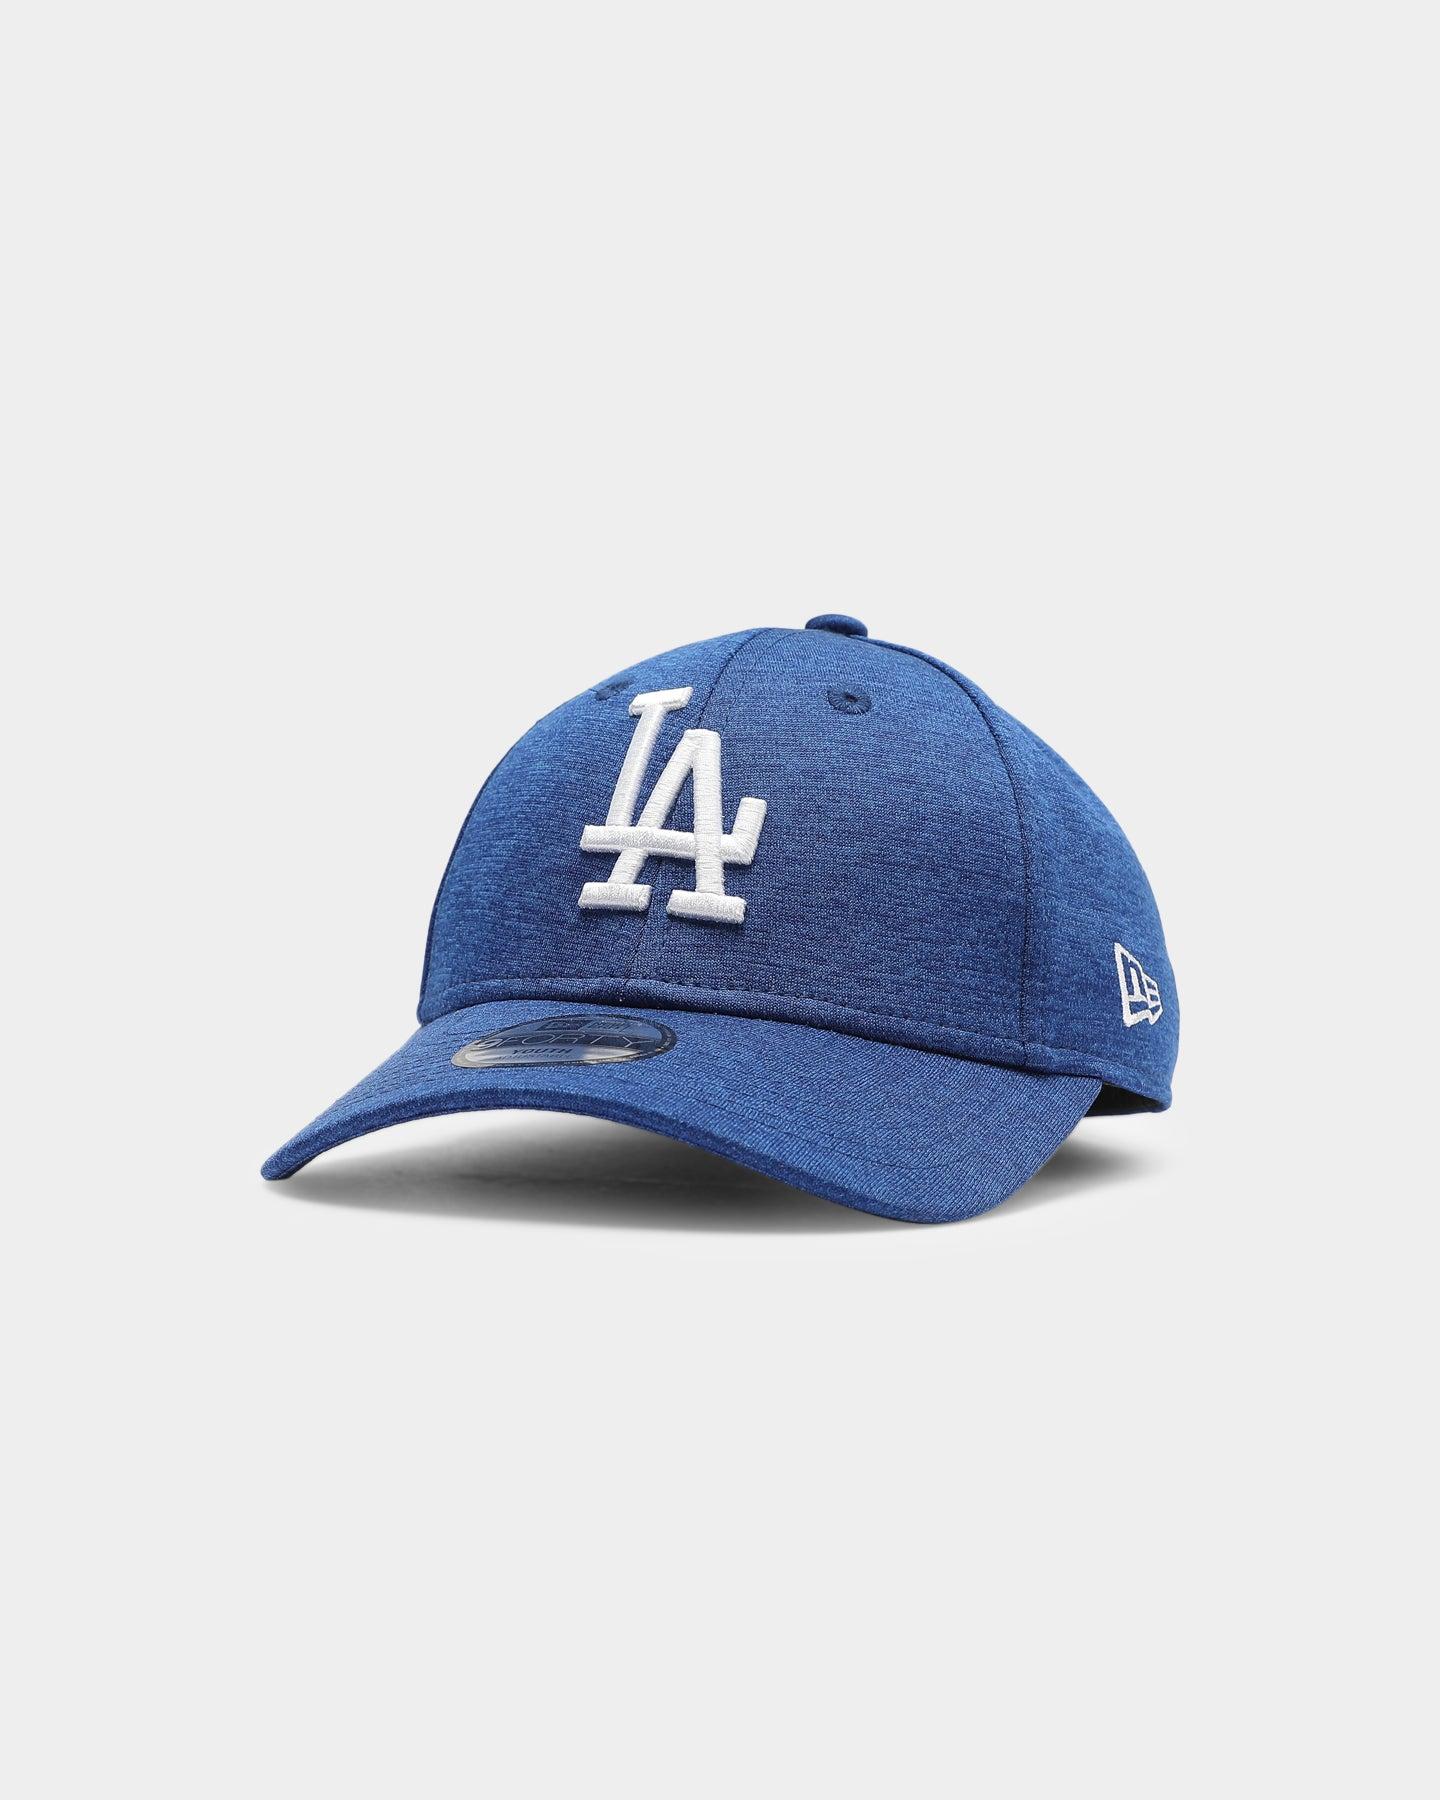 New Era MLB Kids Youth Los Angeles Dodgers Royal Blue Grey 9FIFTY Snapback Cap